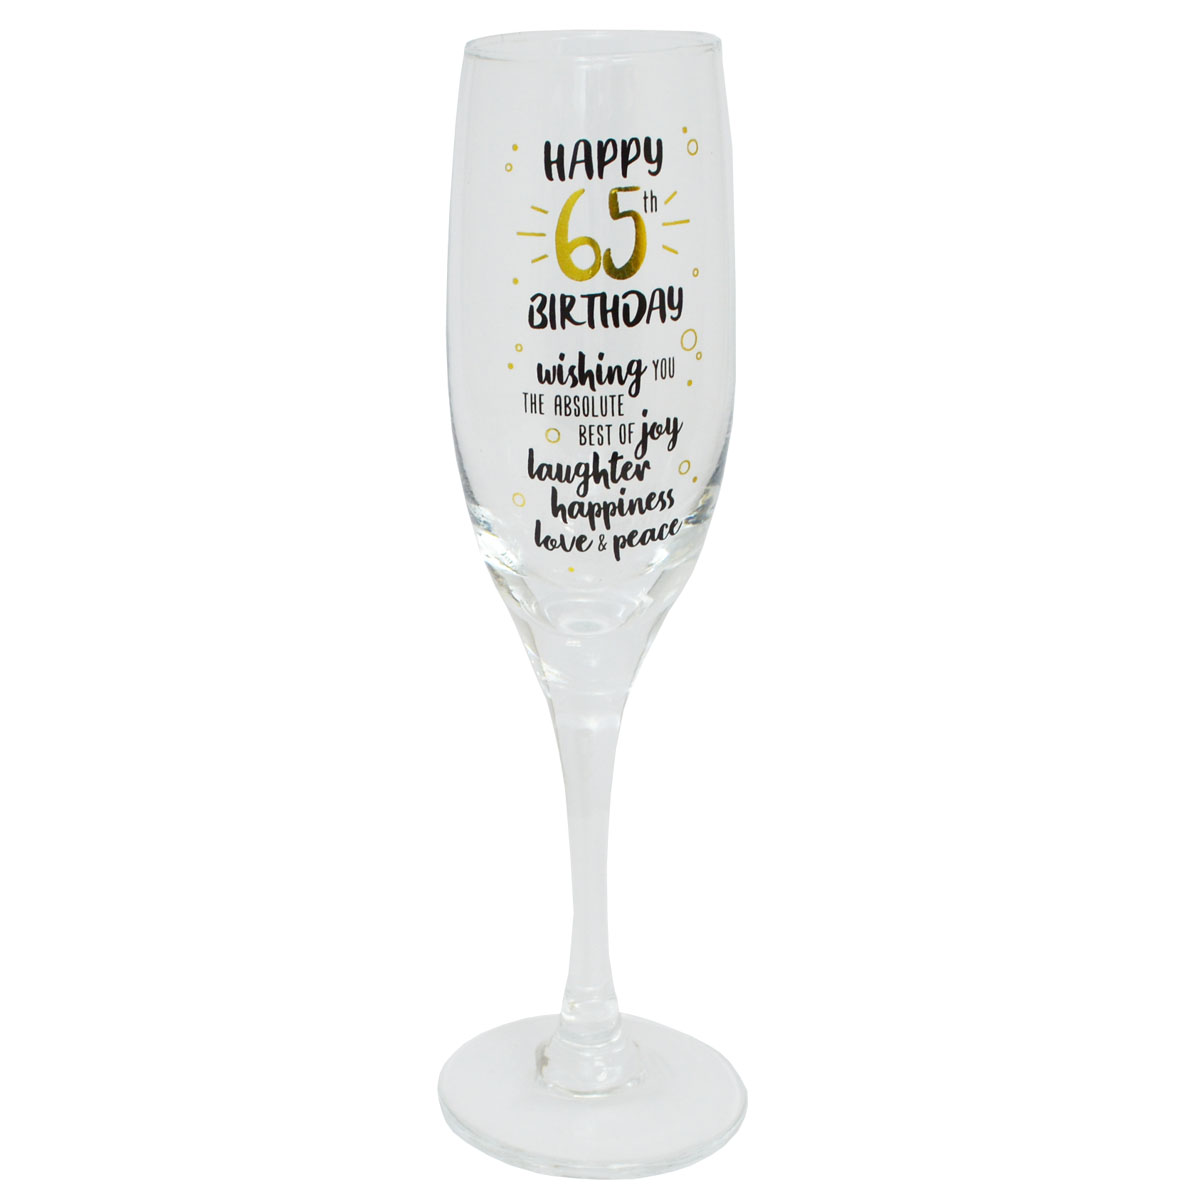 30th Birthday Stars Champagne Flute Glass Gift. G31830